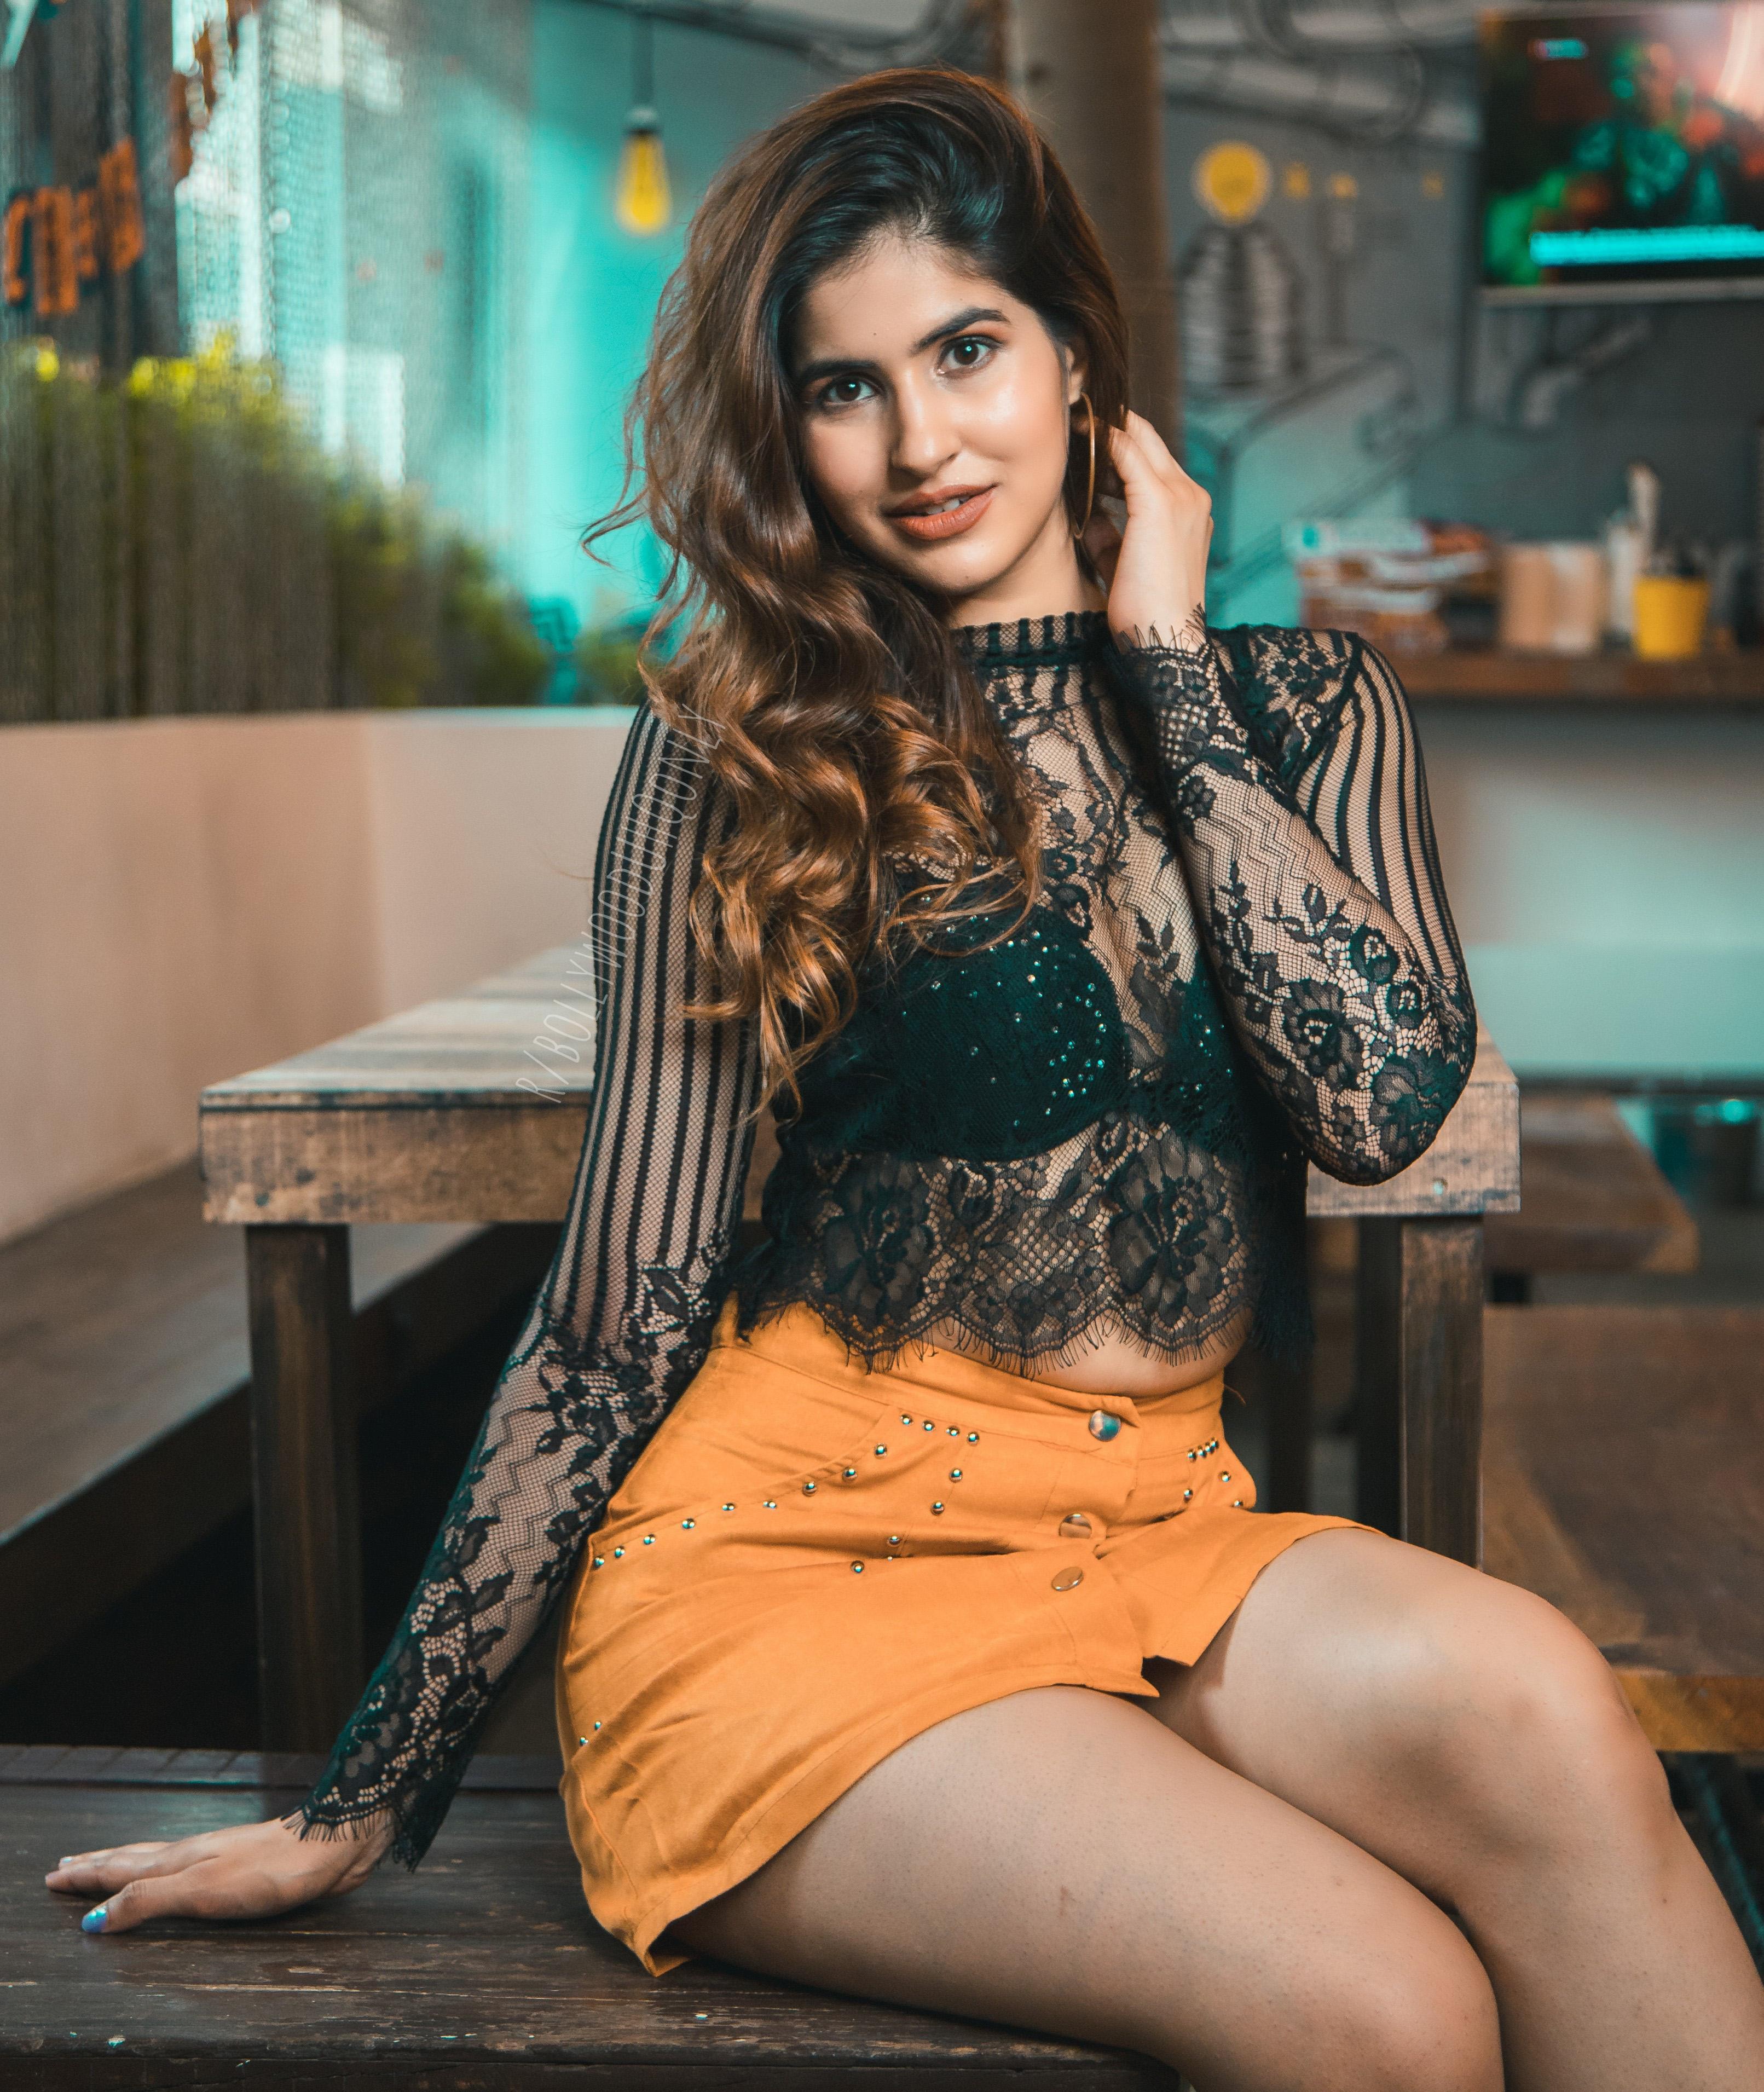 Sakshi Malik 4K Wallpaper. Indian actress. Bollywood actress. Hot model. People. #2023